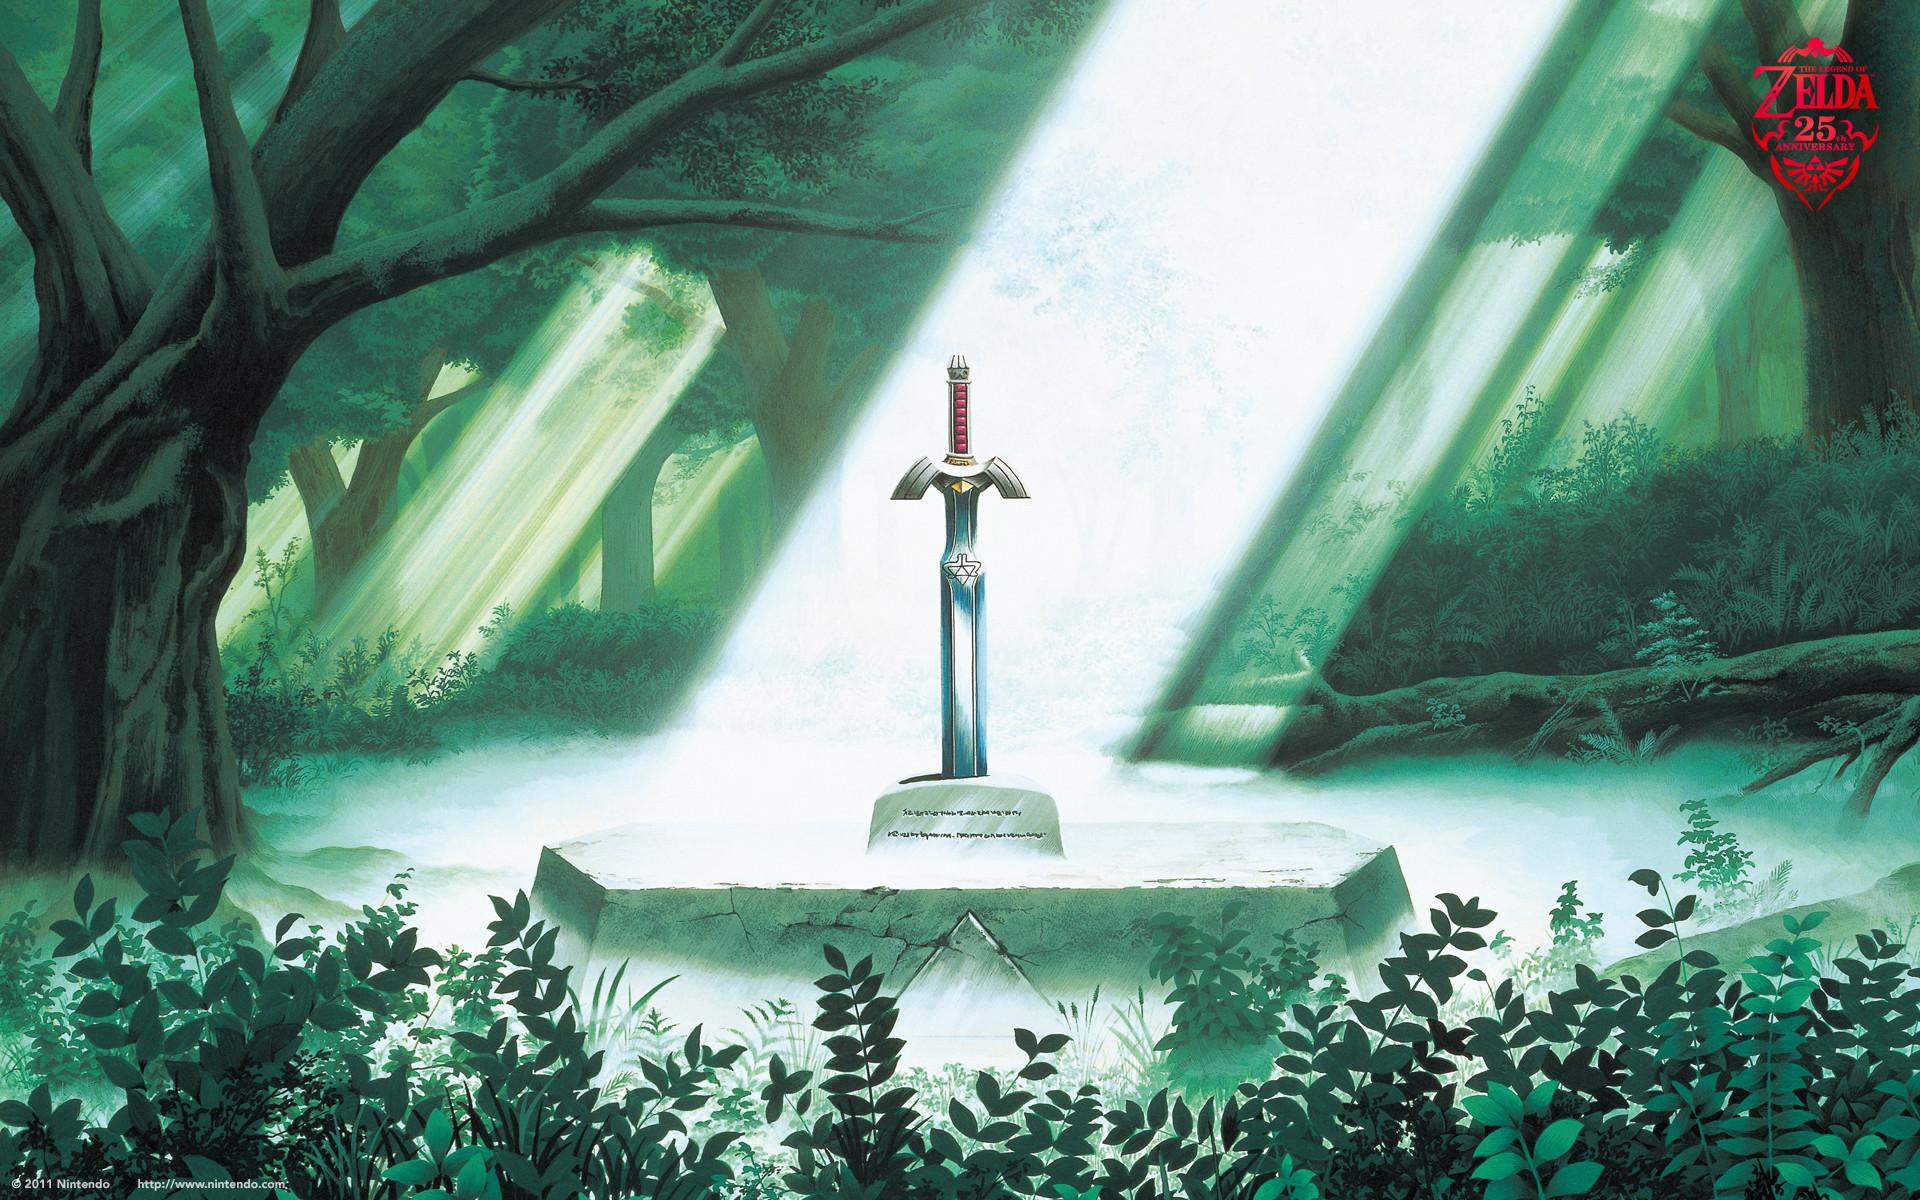 The Legend of Zelda Wallpaper (Link to the Past) – The Master Sword Rests